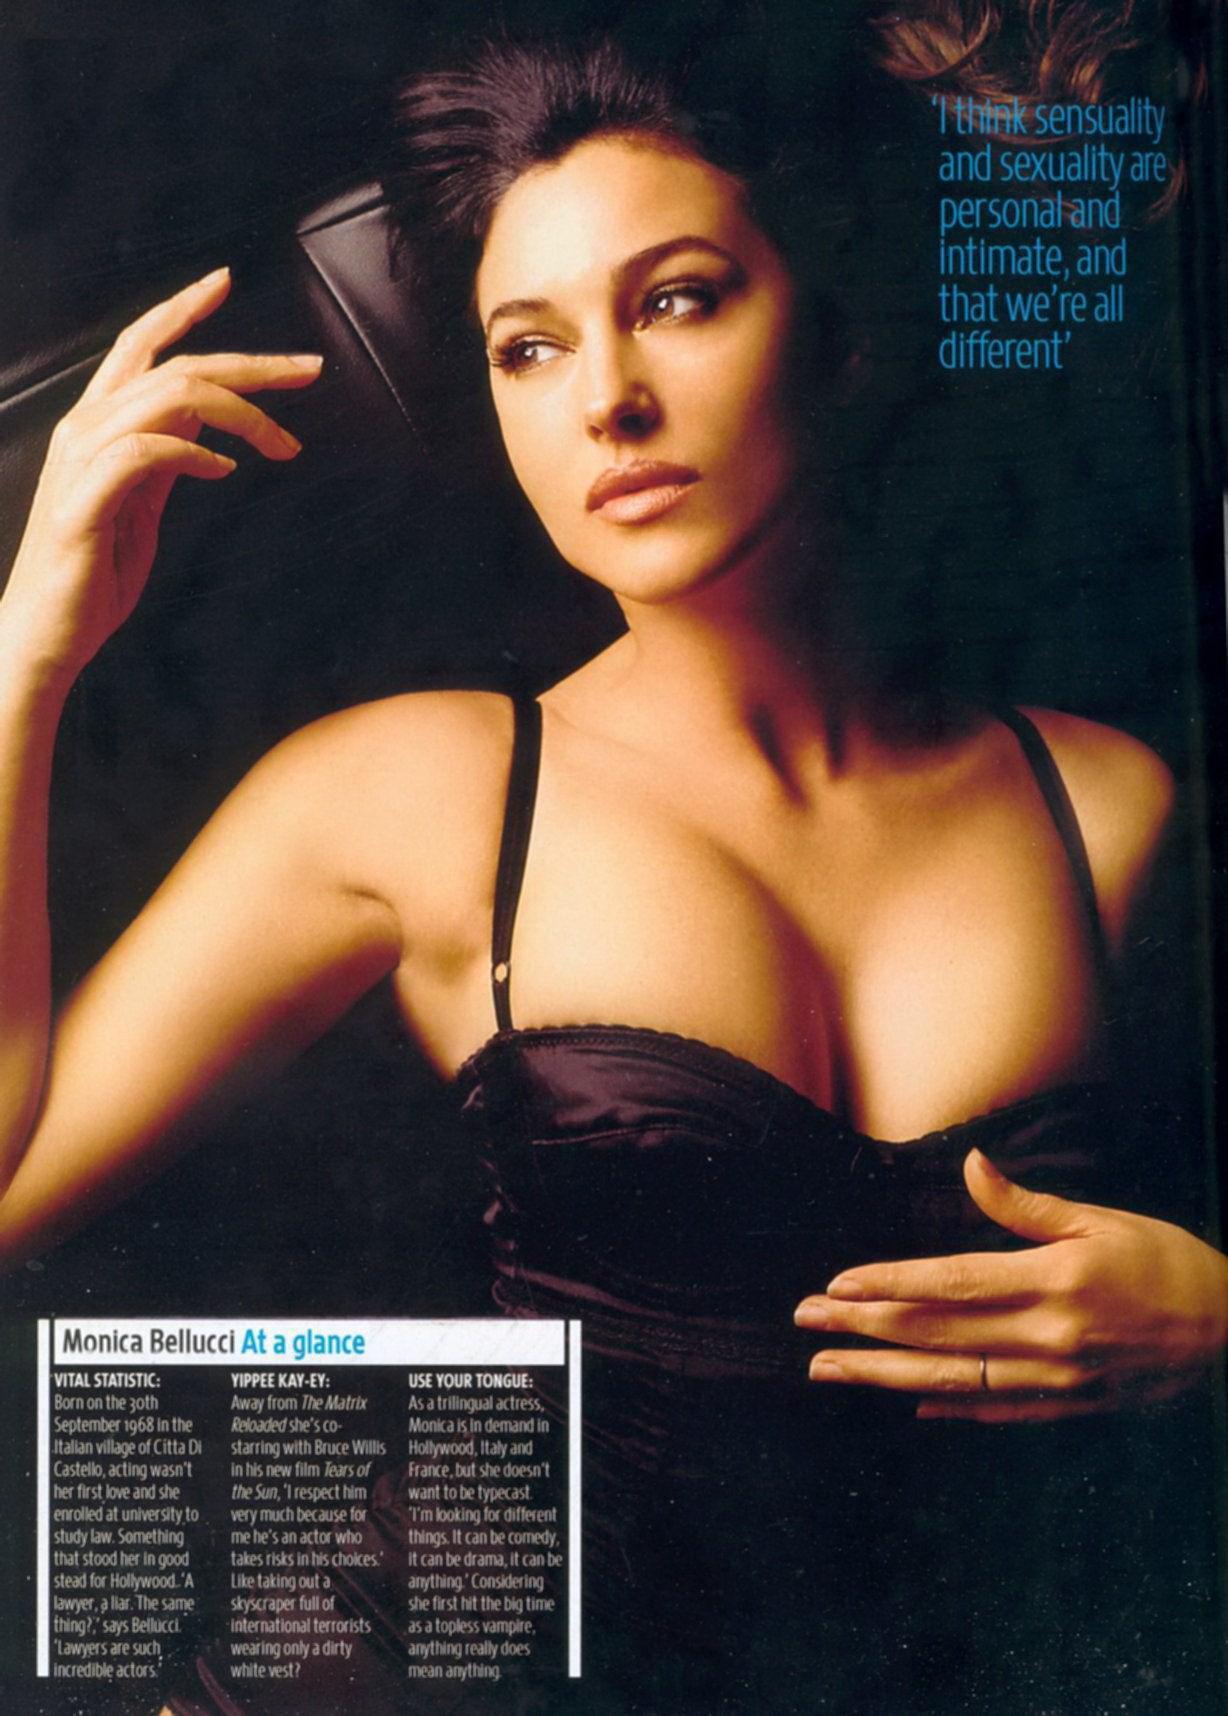 Monica Bellucci culonas 1